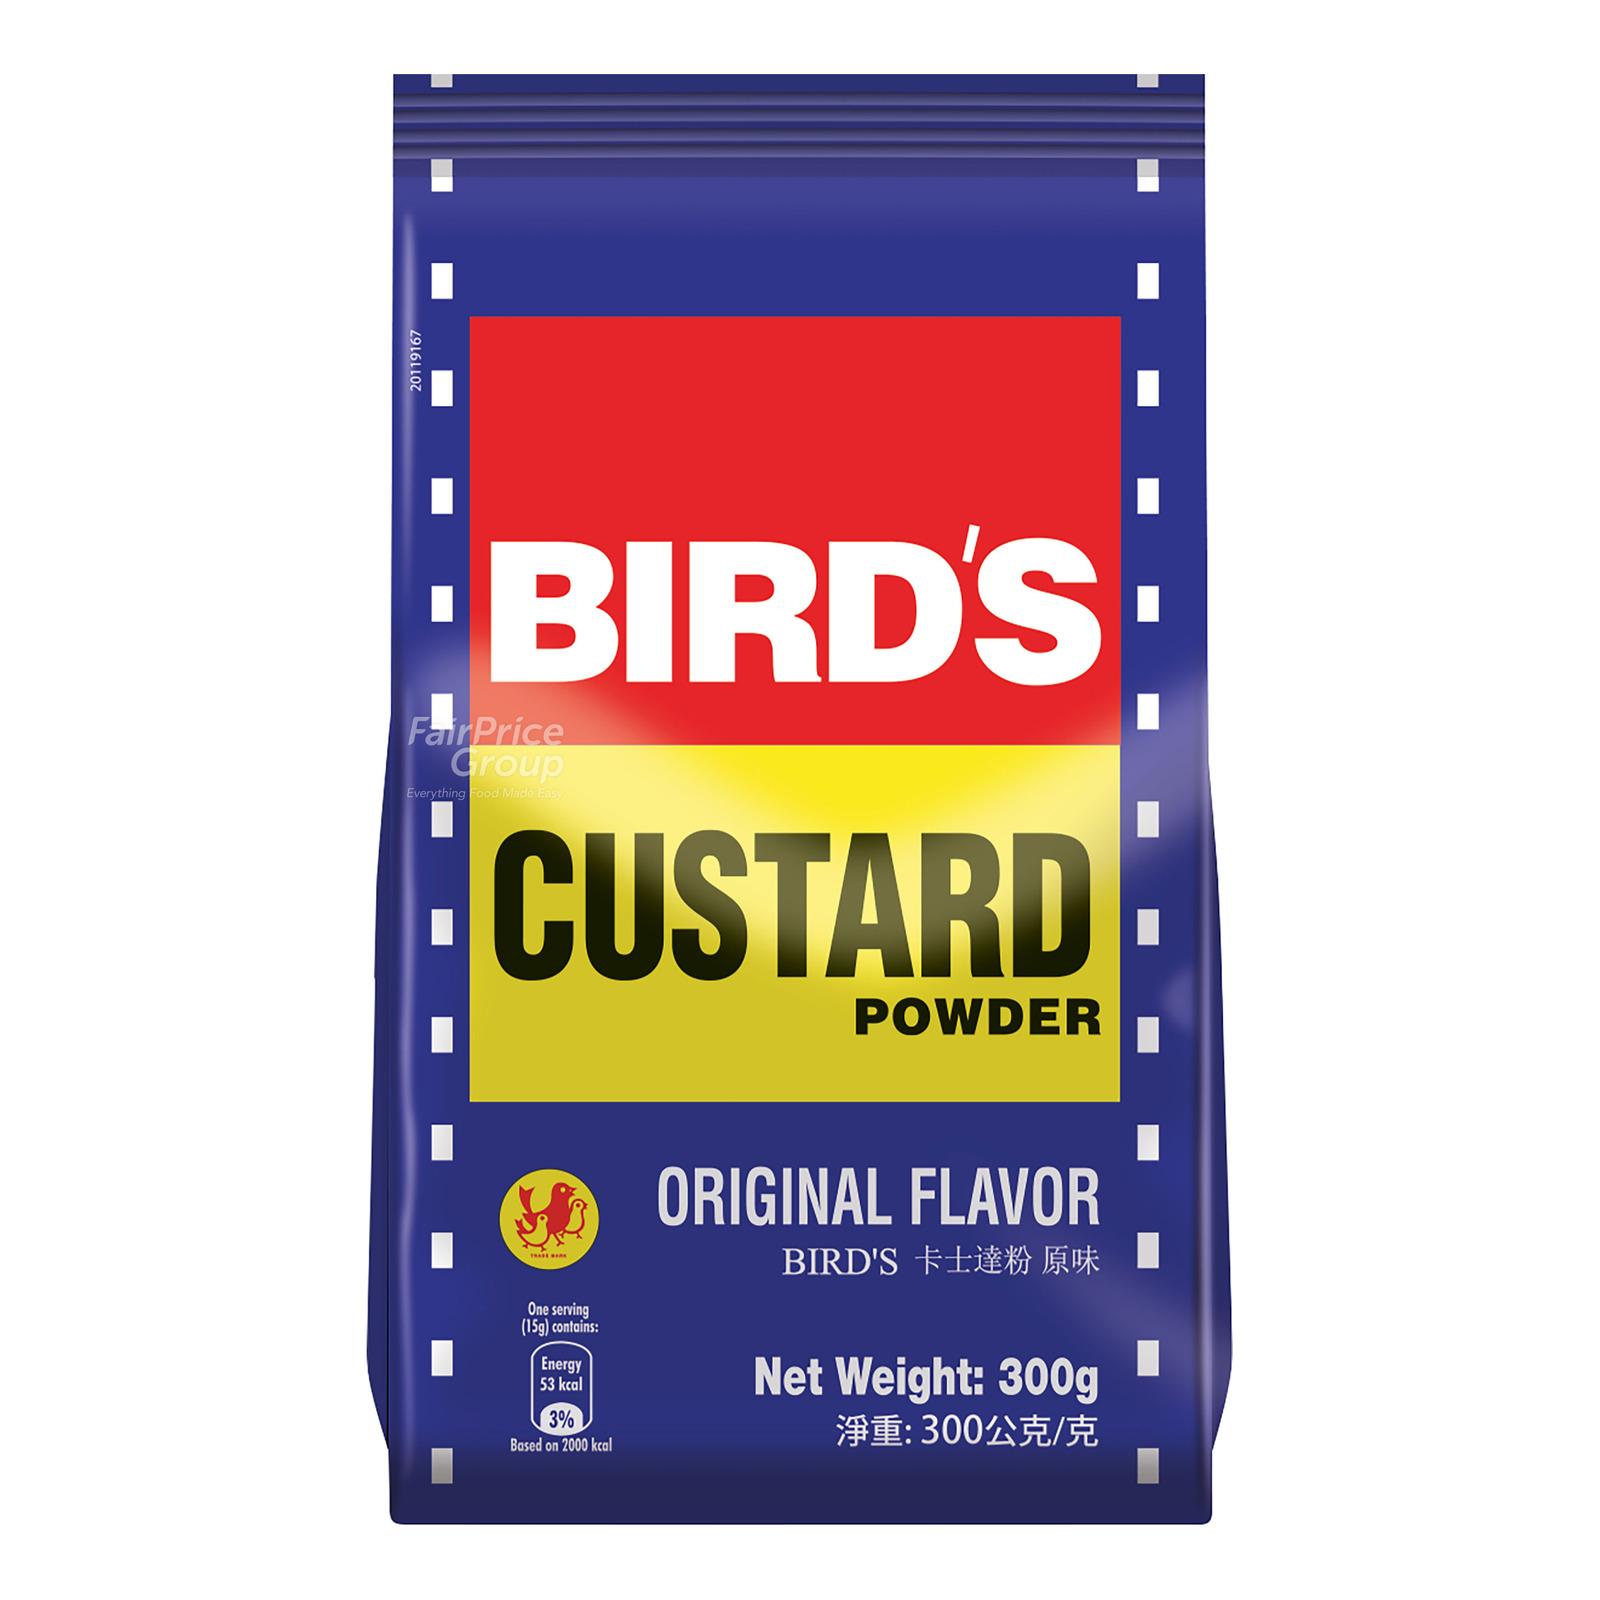 Bird's Custard Powder - Original